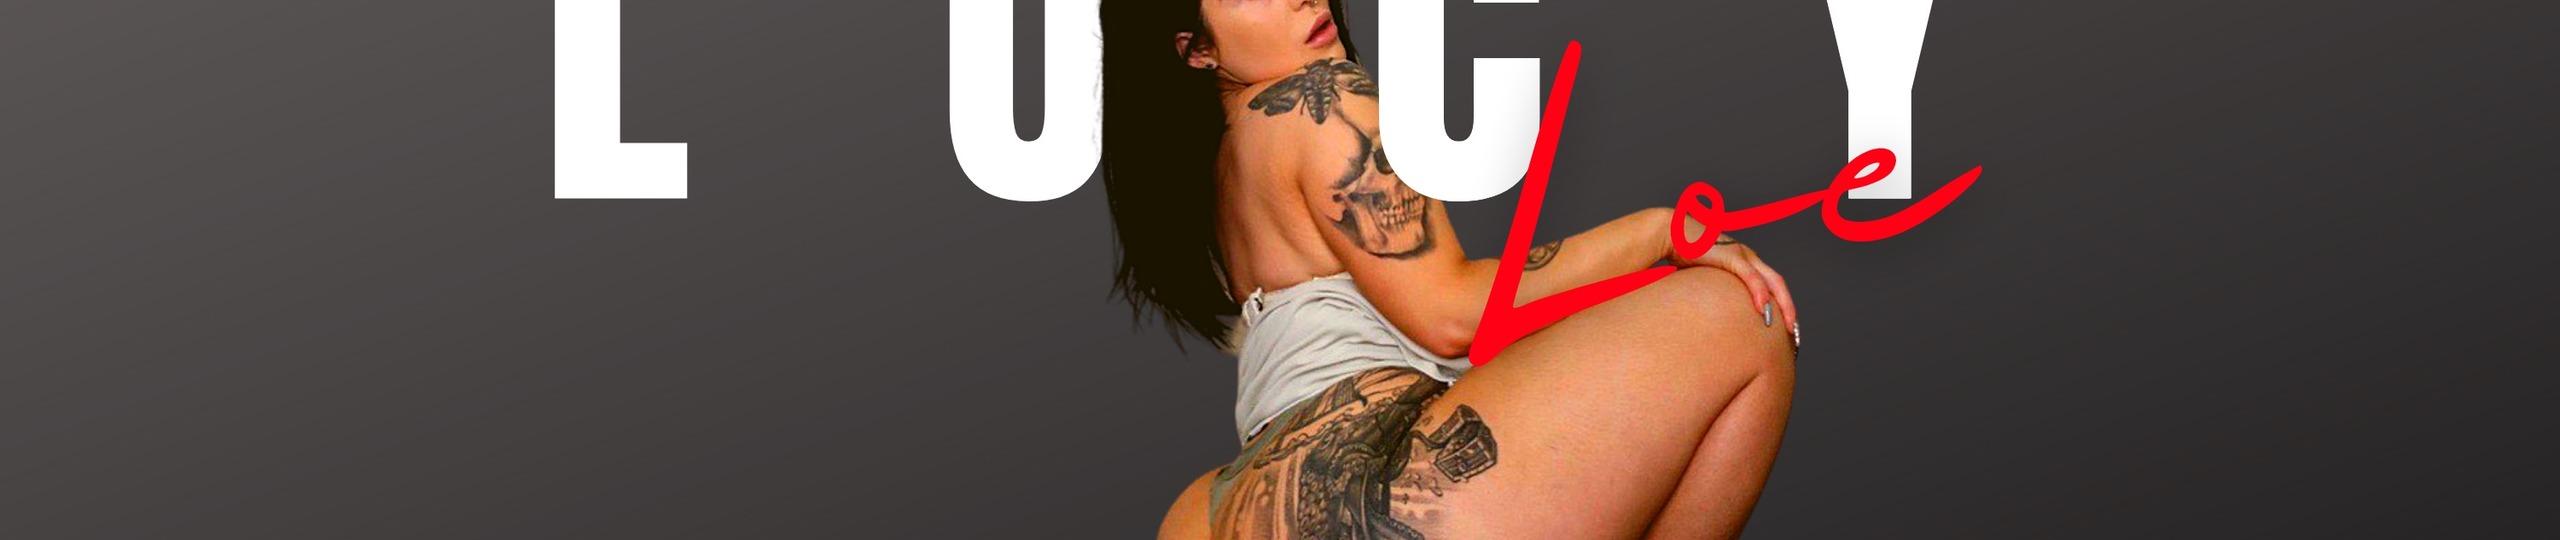 Lucy Loe Fat Ass Fuck Slut - profile image